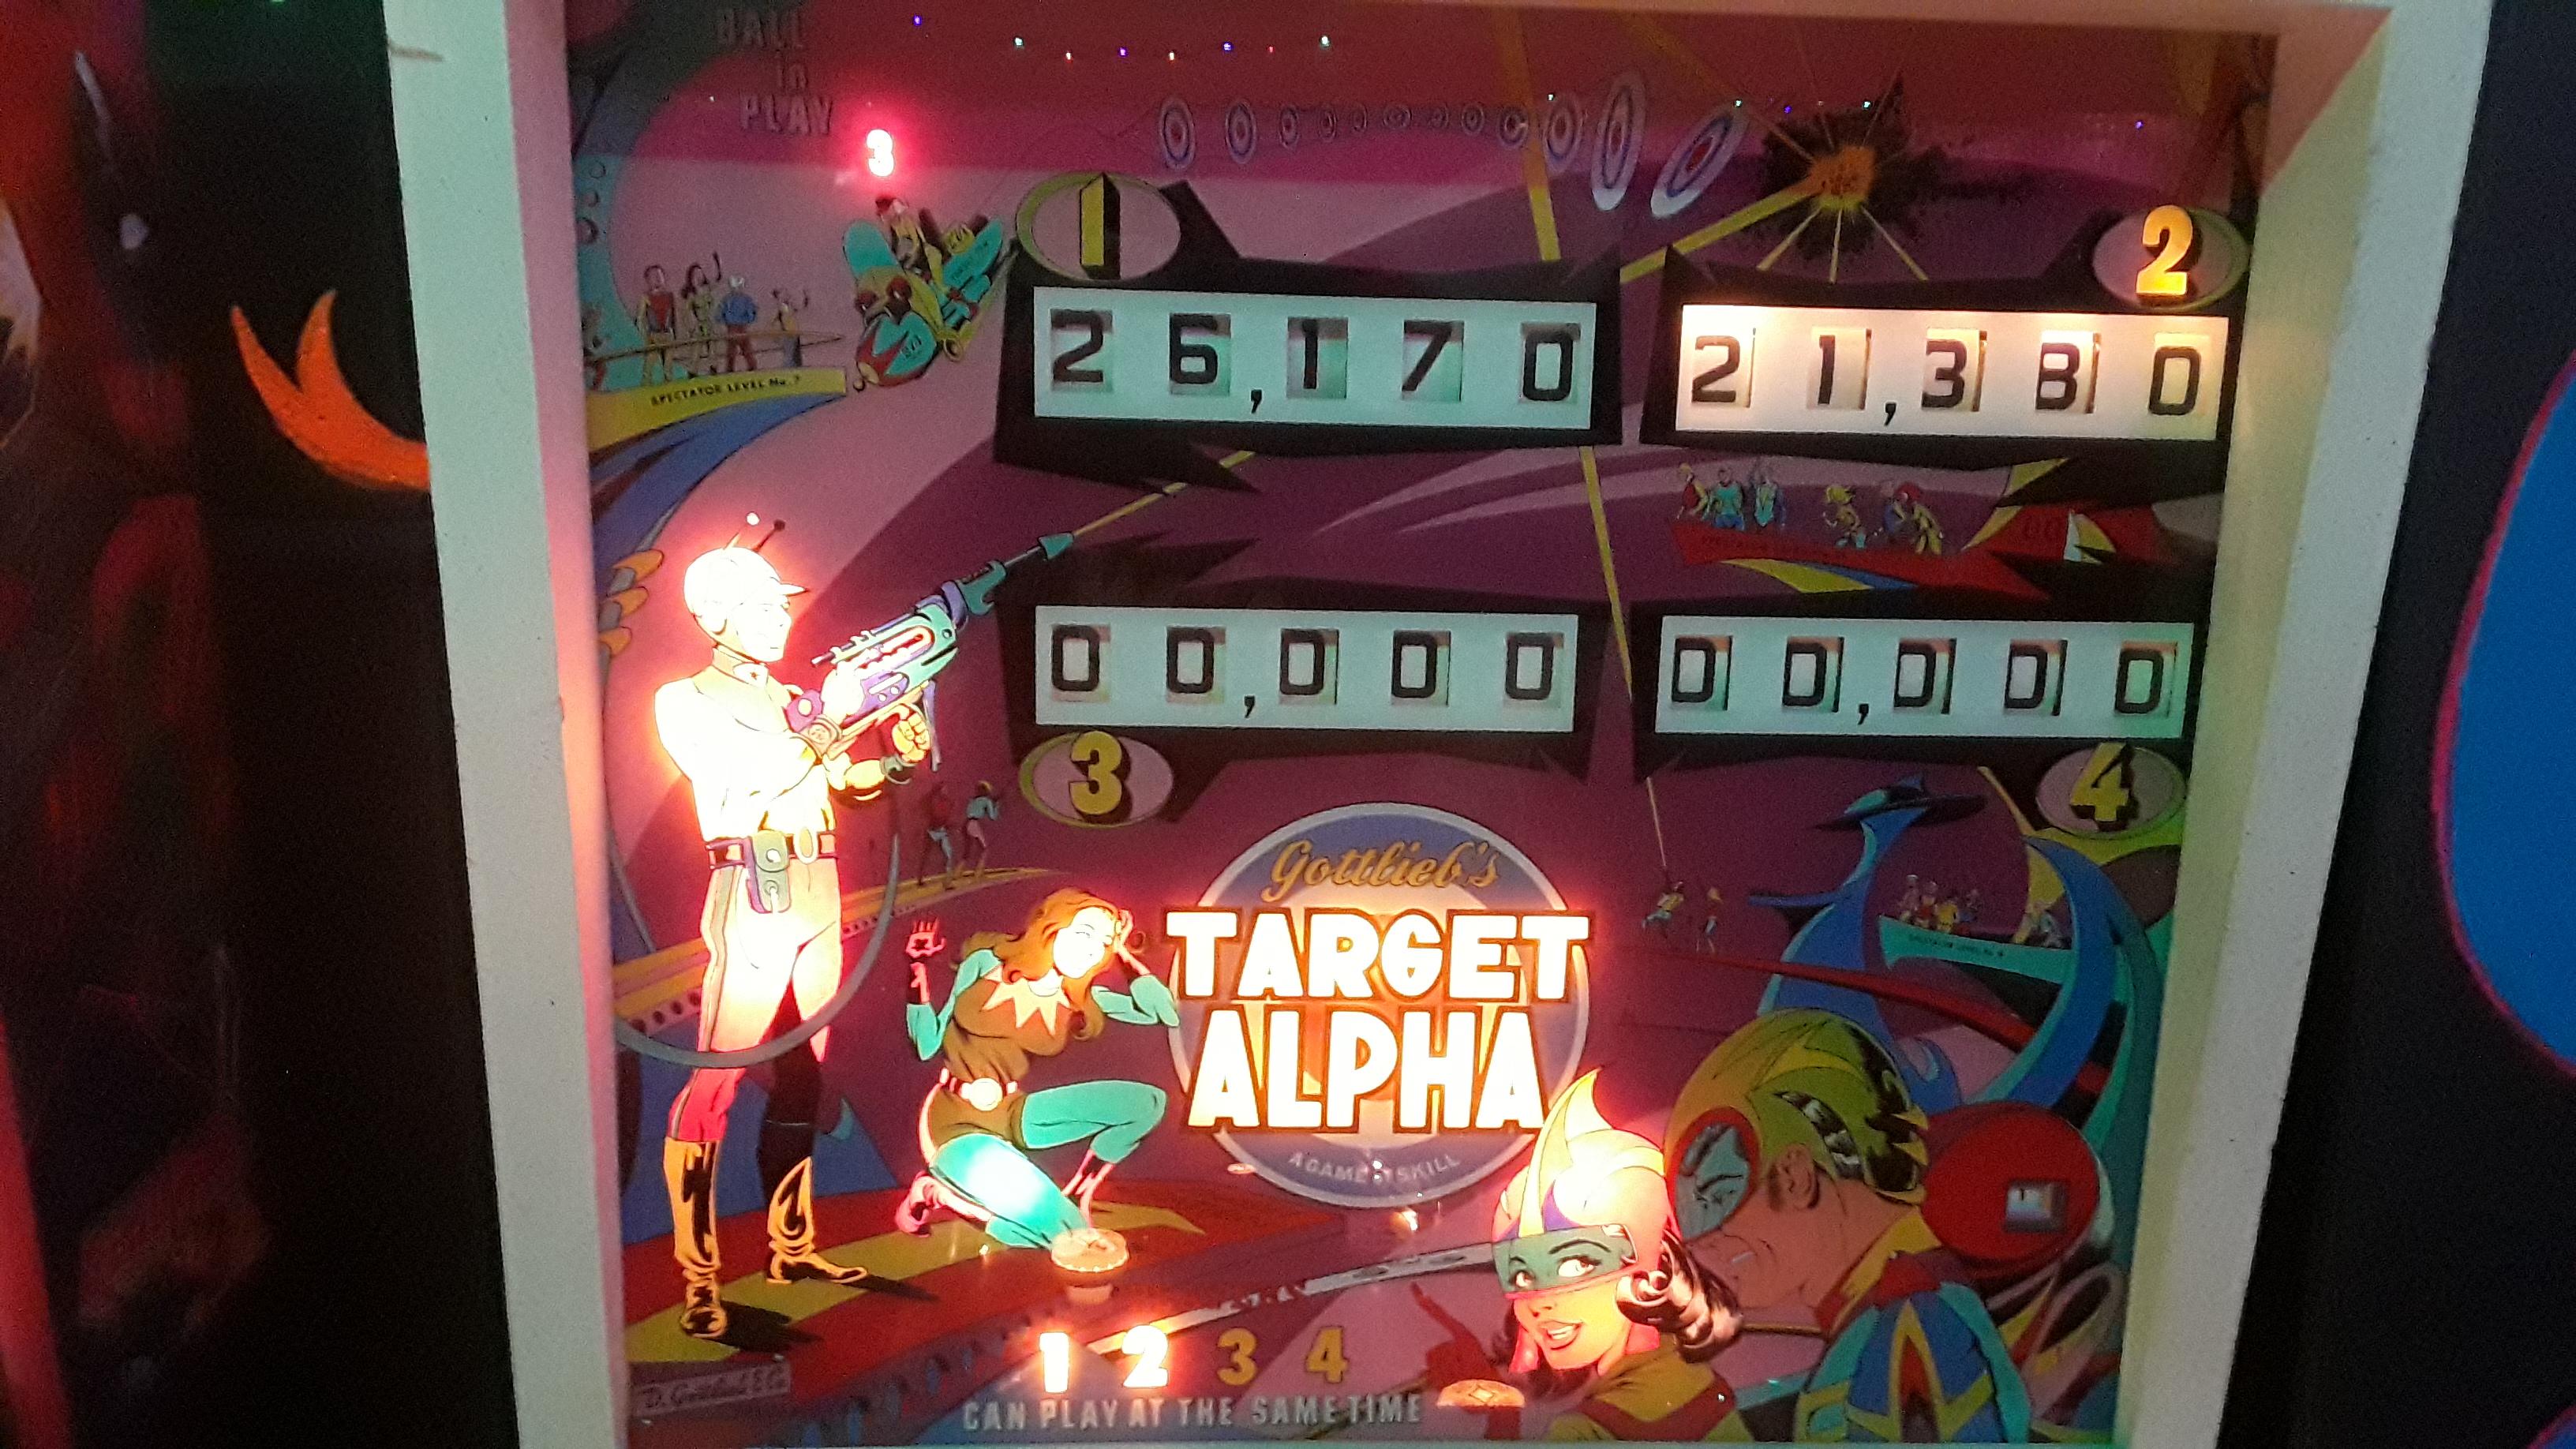 JML101582: Target Alpha (Pinball: 3 Balls) 26,170 points on 2019-12-28 17:16:27